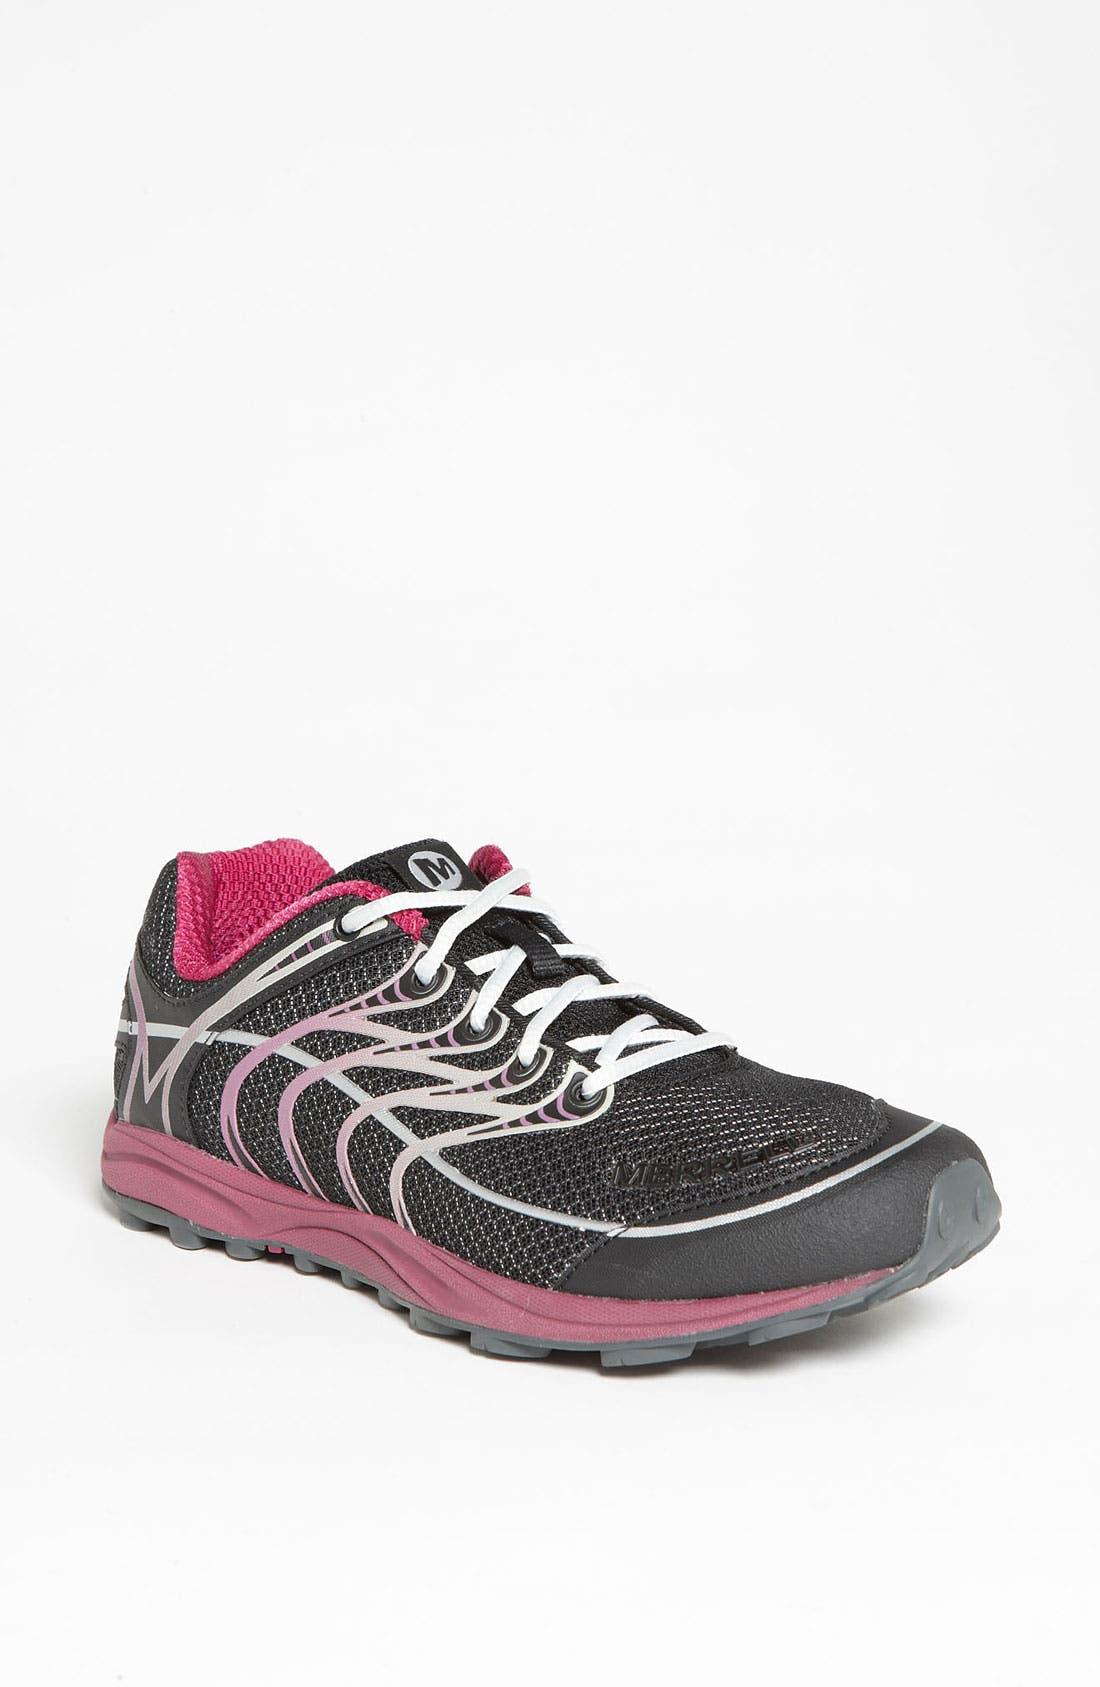 Main Image - Merrell 'Mix Master Road Glide' Running Shoe (Women)